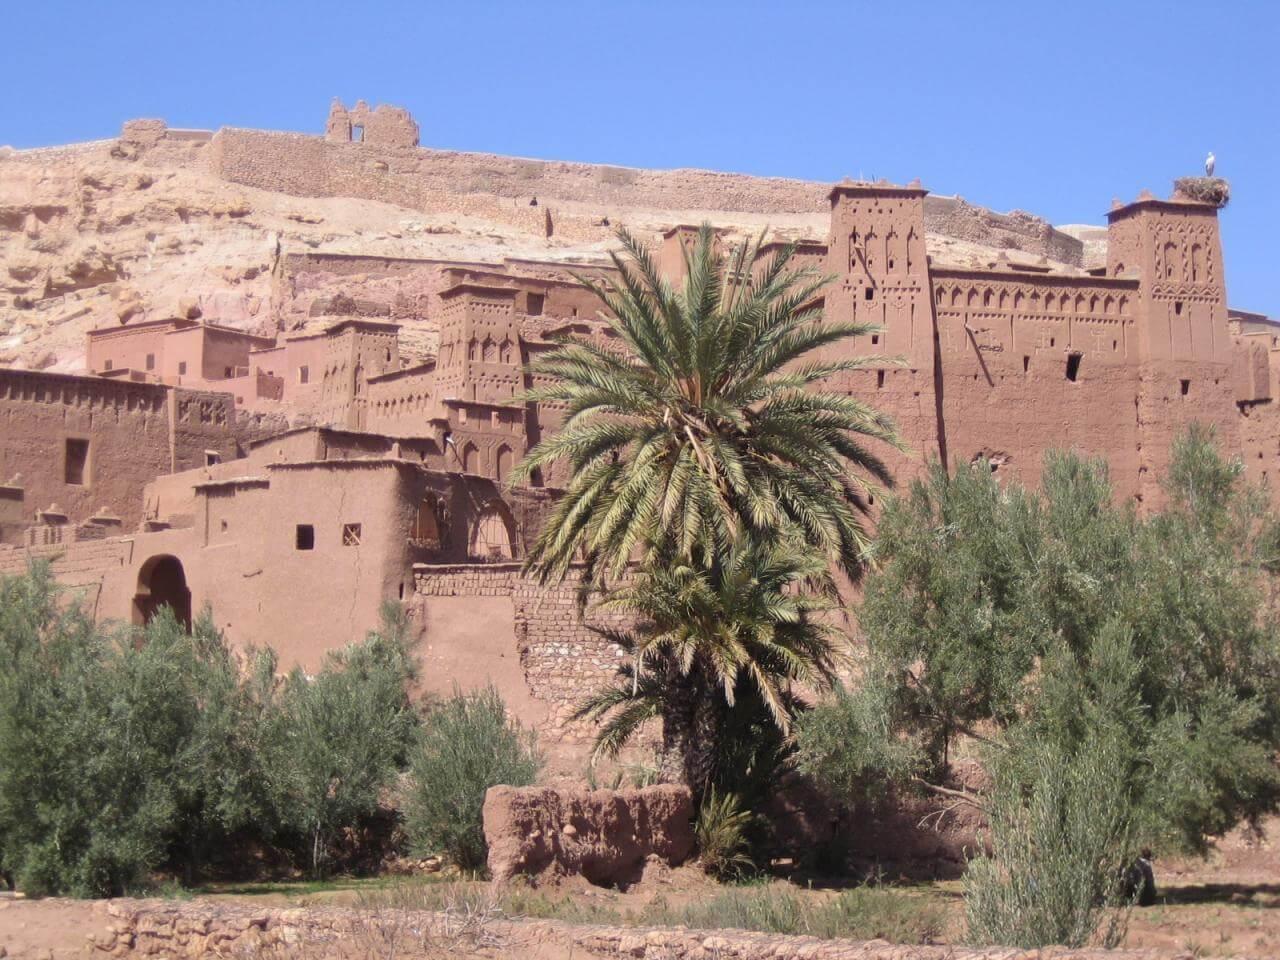 Autovermietung-Mietwagen-Marrakesch-Ait Benhaddou